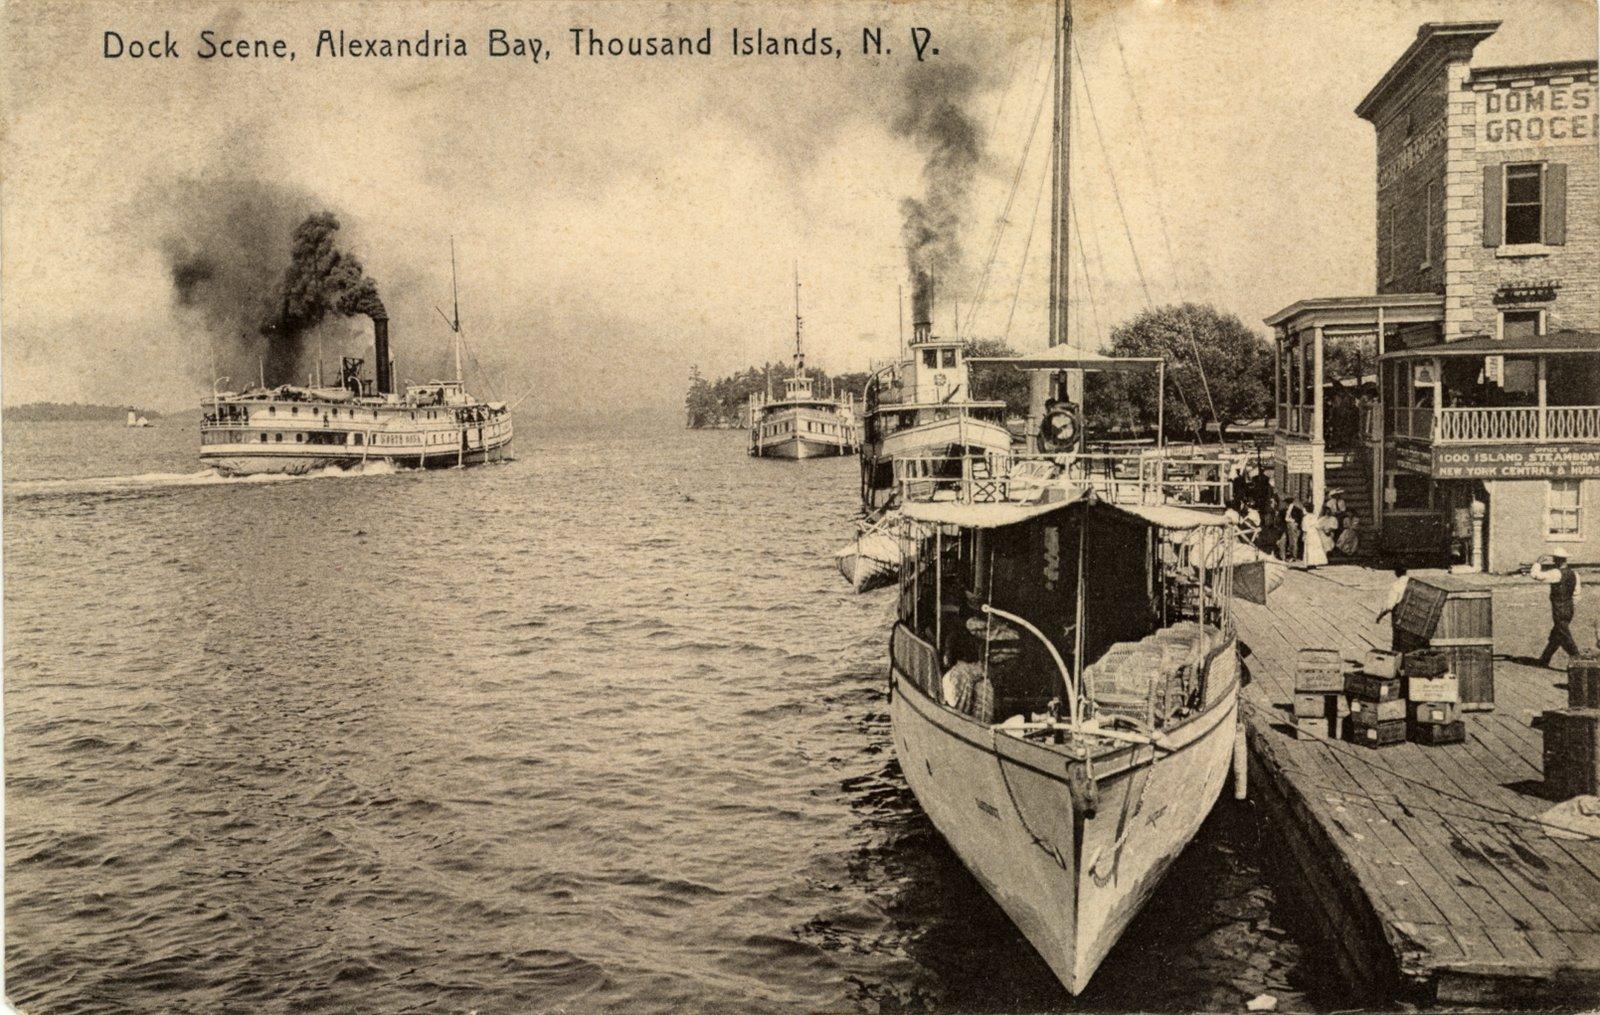 Dock Scene, Alexandria Bay, Thousand Islands, N. Y.